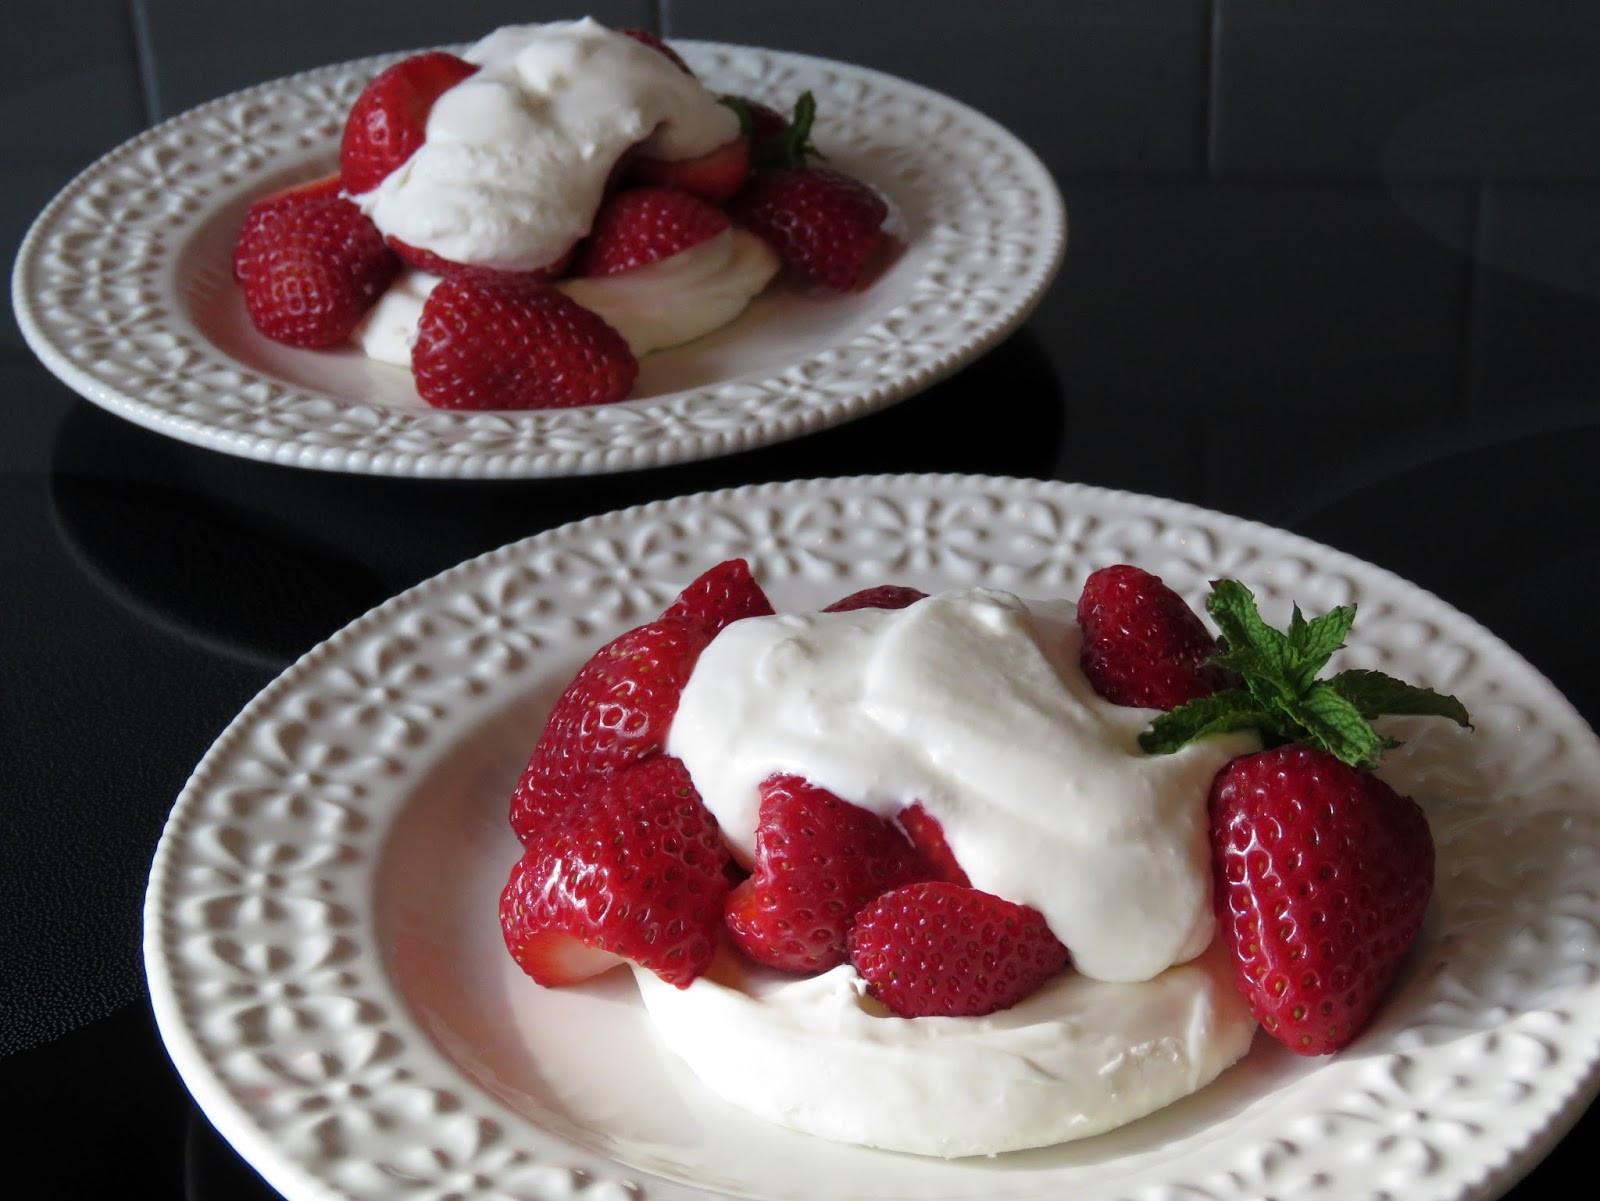 Strawberry Cream Cheese Desserts  Mennonite Girls Can Cook Strawberry Cream Cheese Clouds